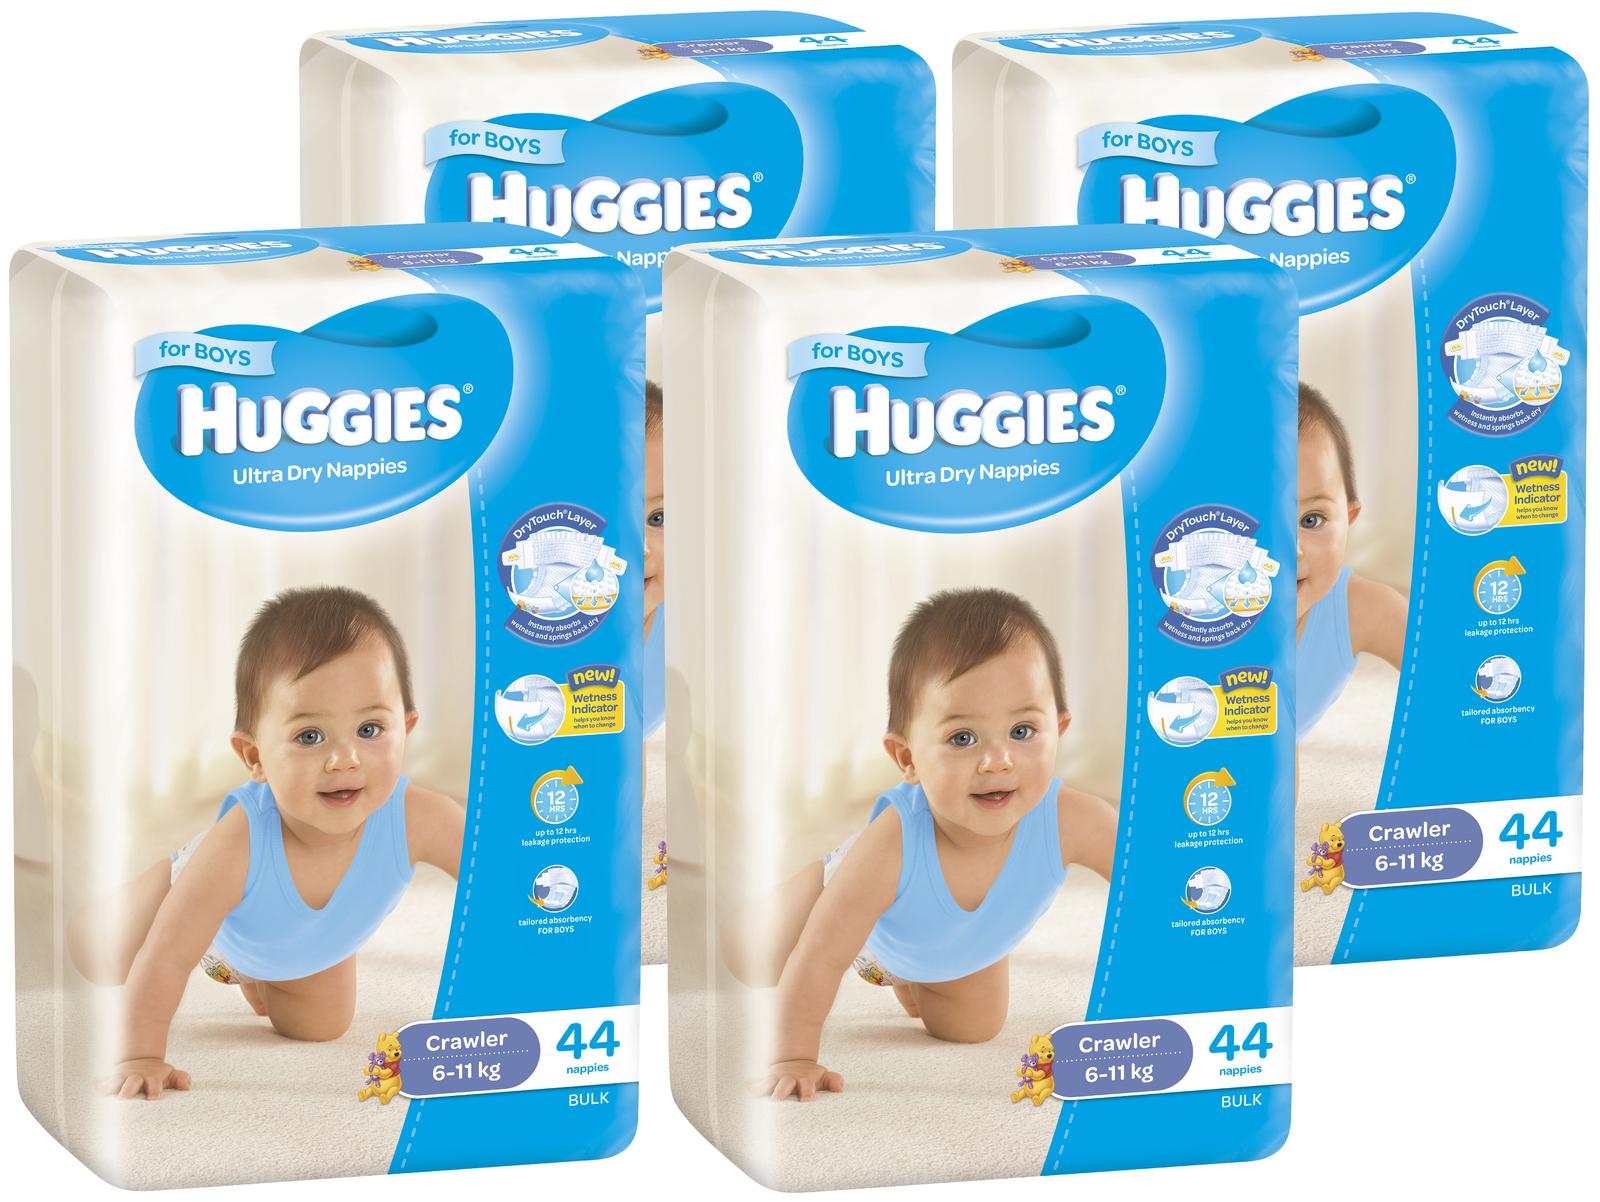 buy huggies nappies bulk shipper crawler boy 6 11kg 176 at mighty ape nz